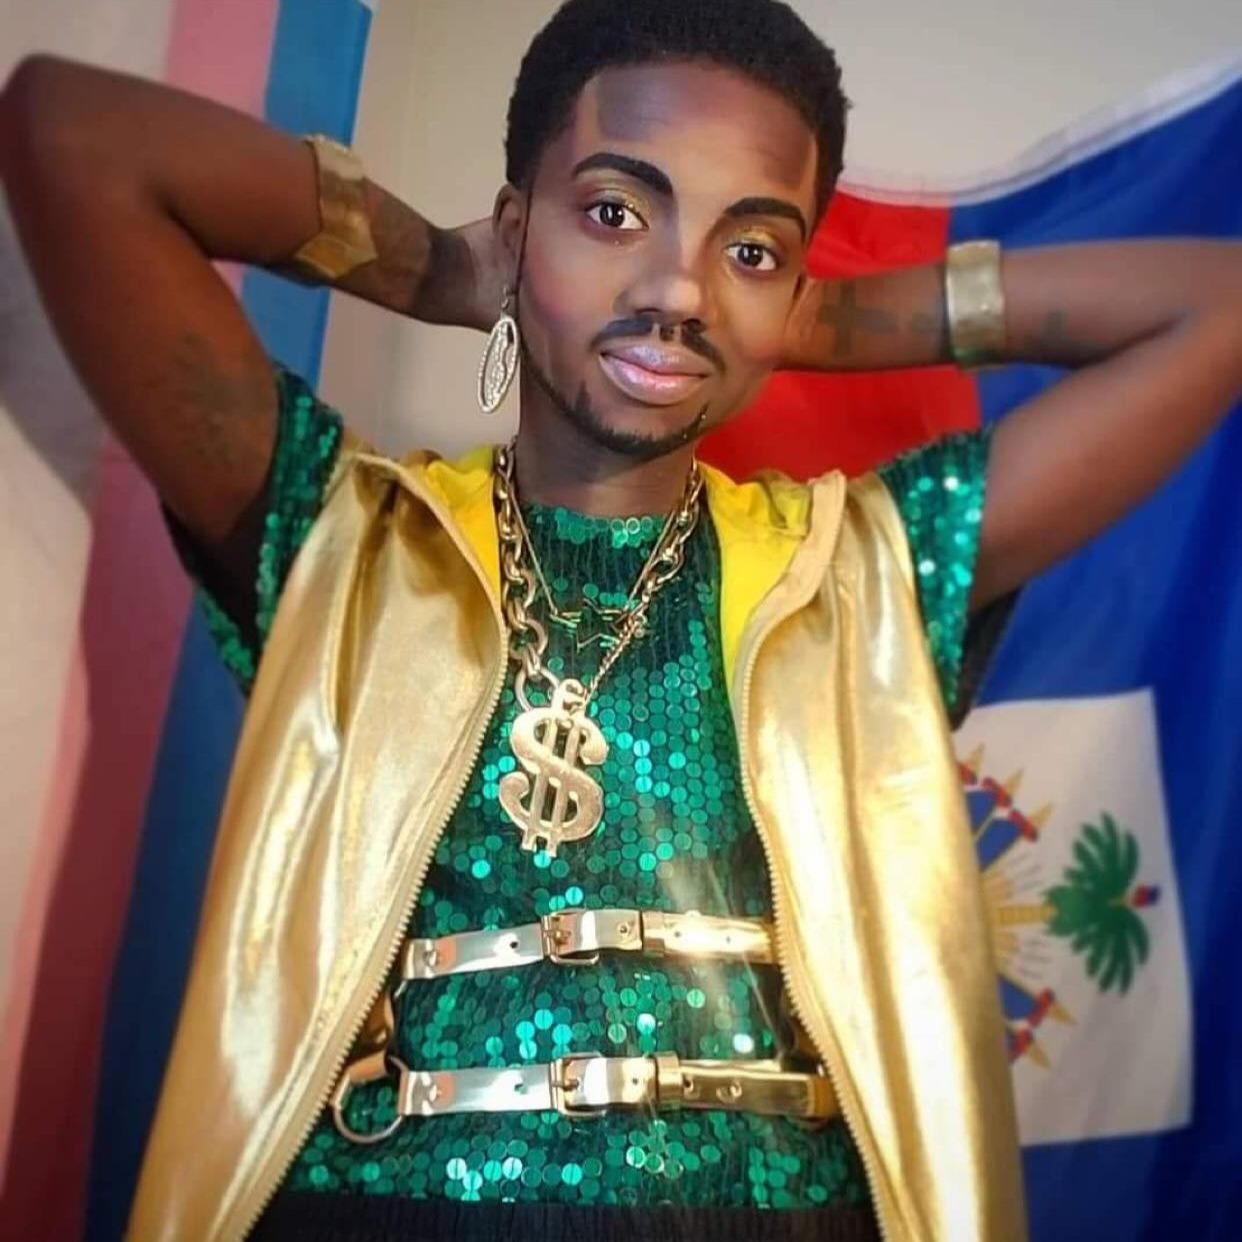 King Perka$exx